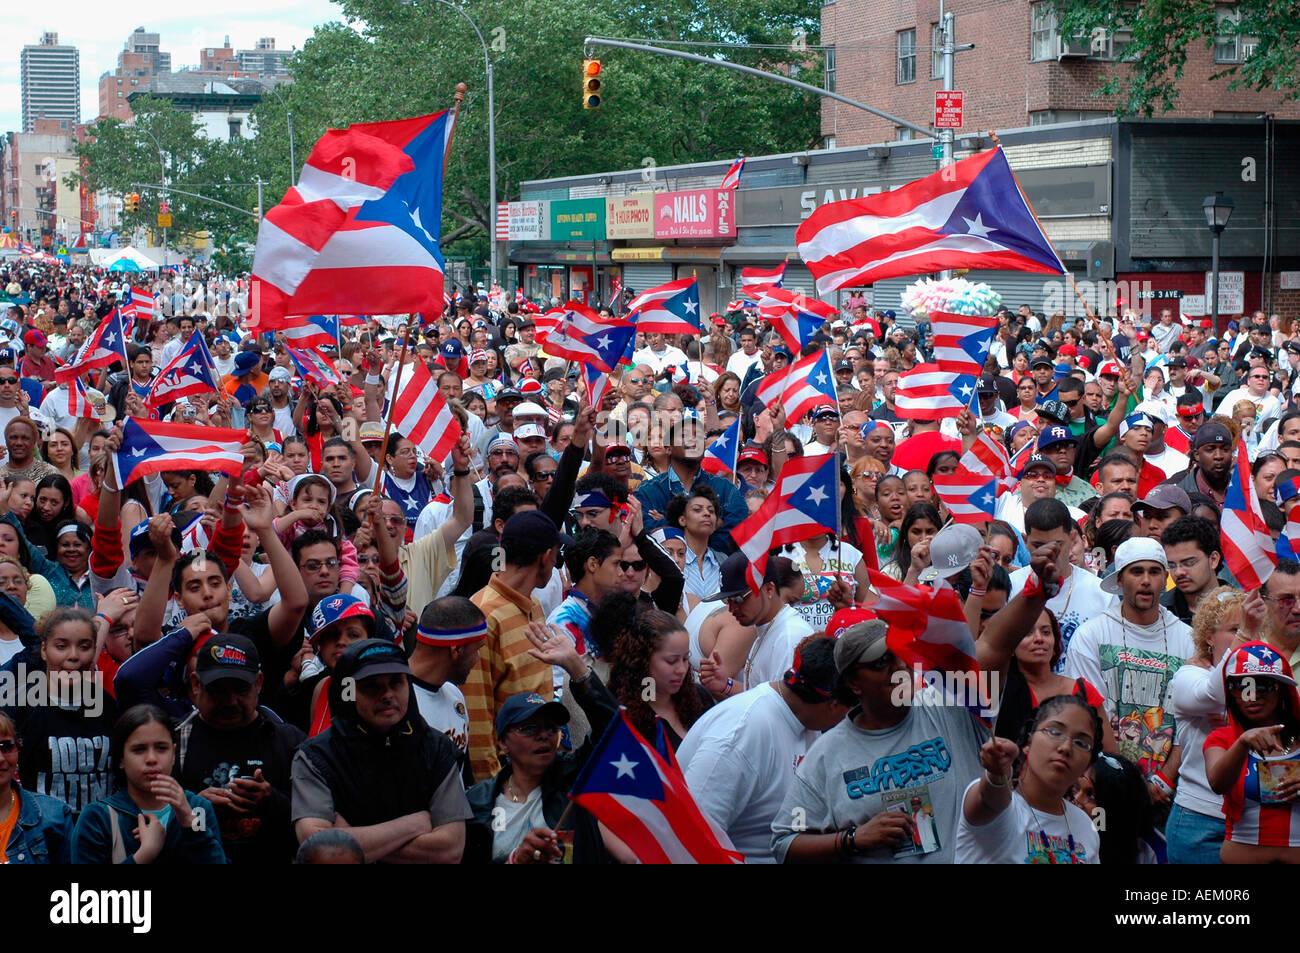 116th street puerto rican festival 2014 4 sample - 1 4